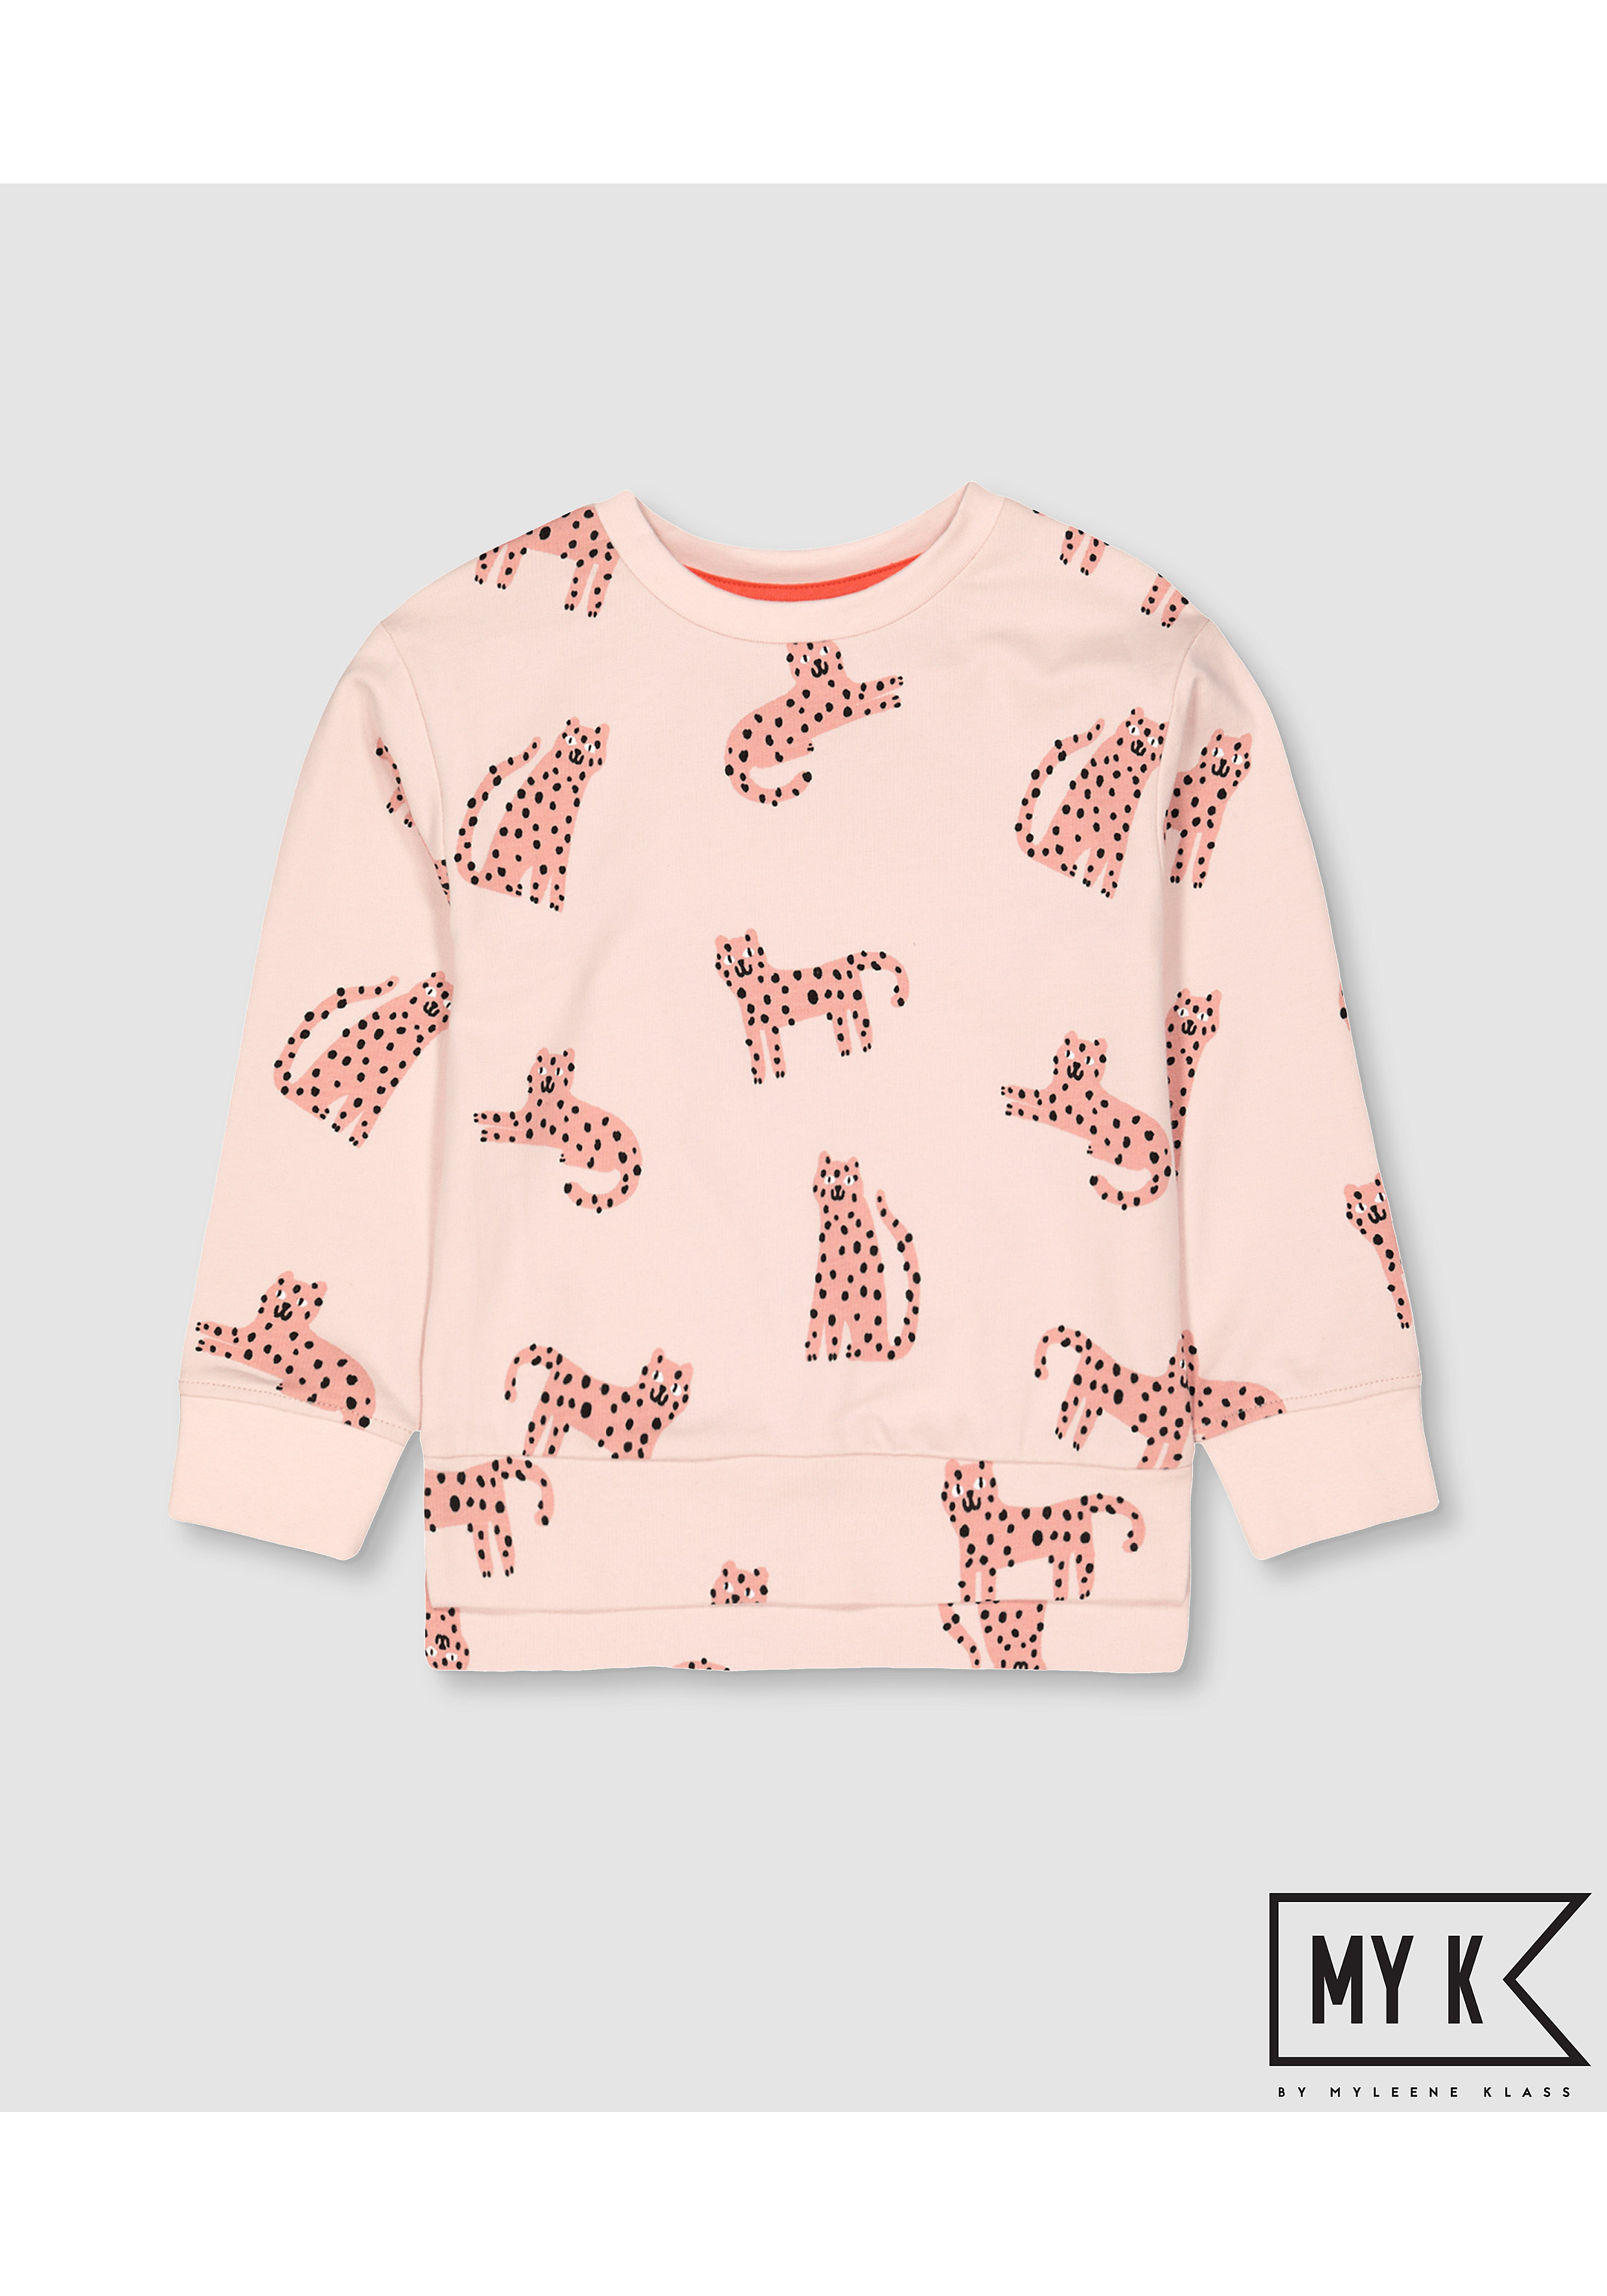 Mothercare | Girls Full Sleeves Sweatshirts  - Pink